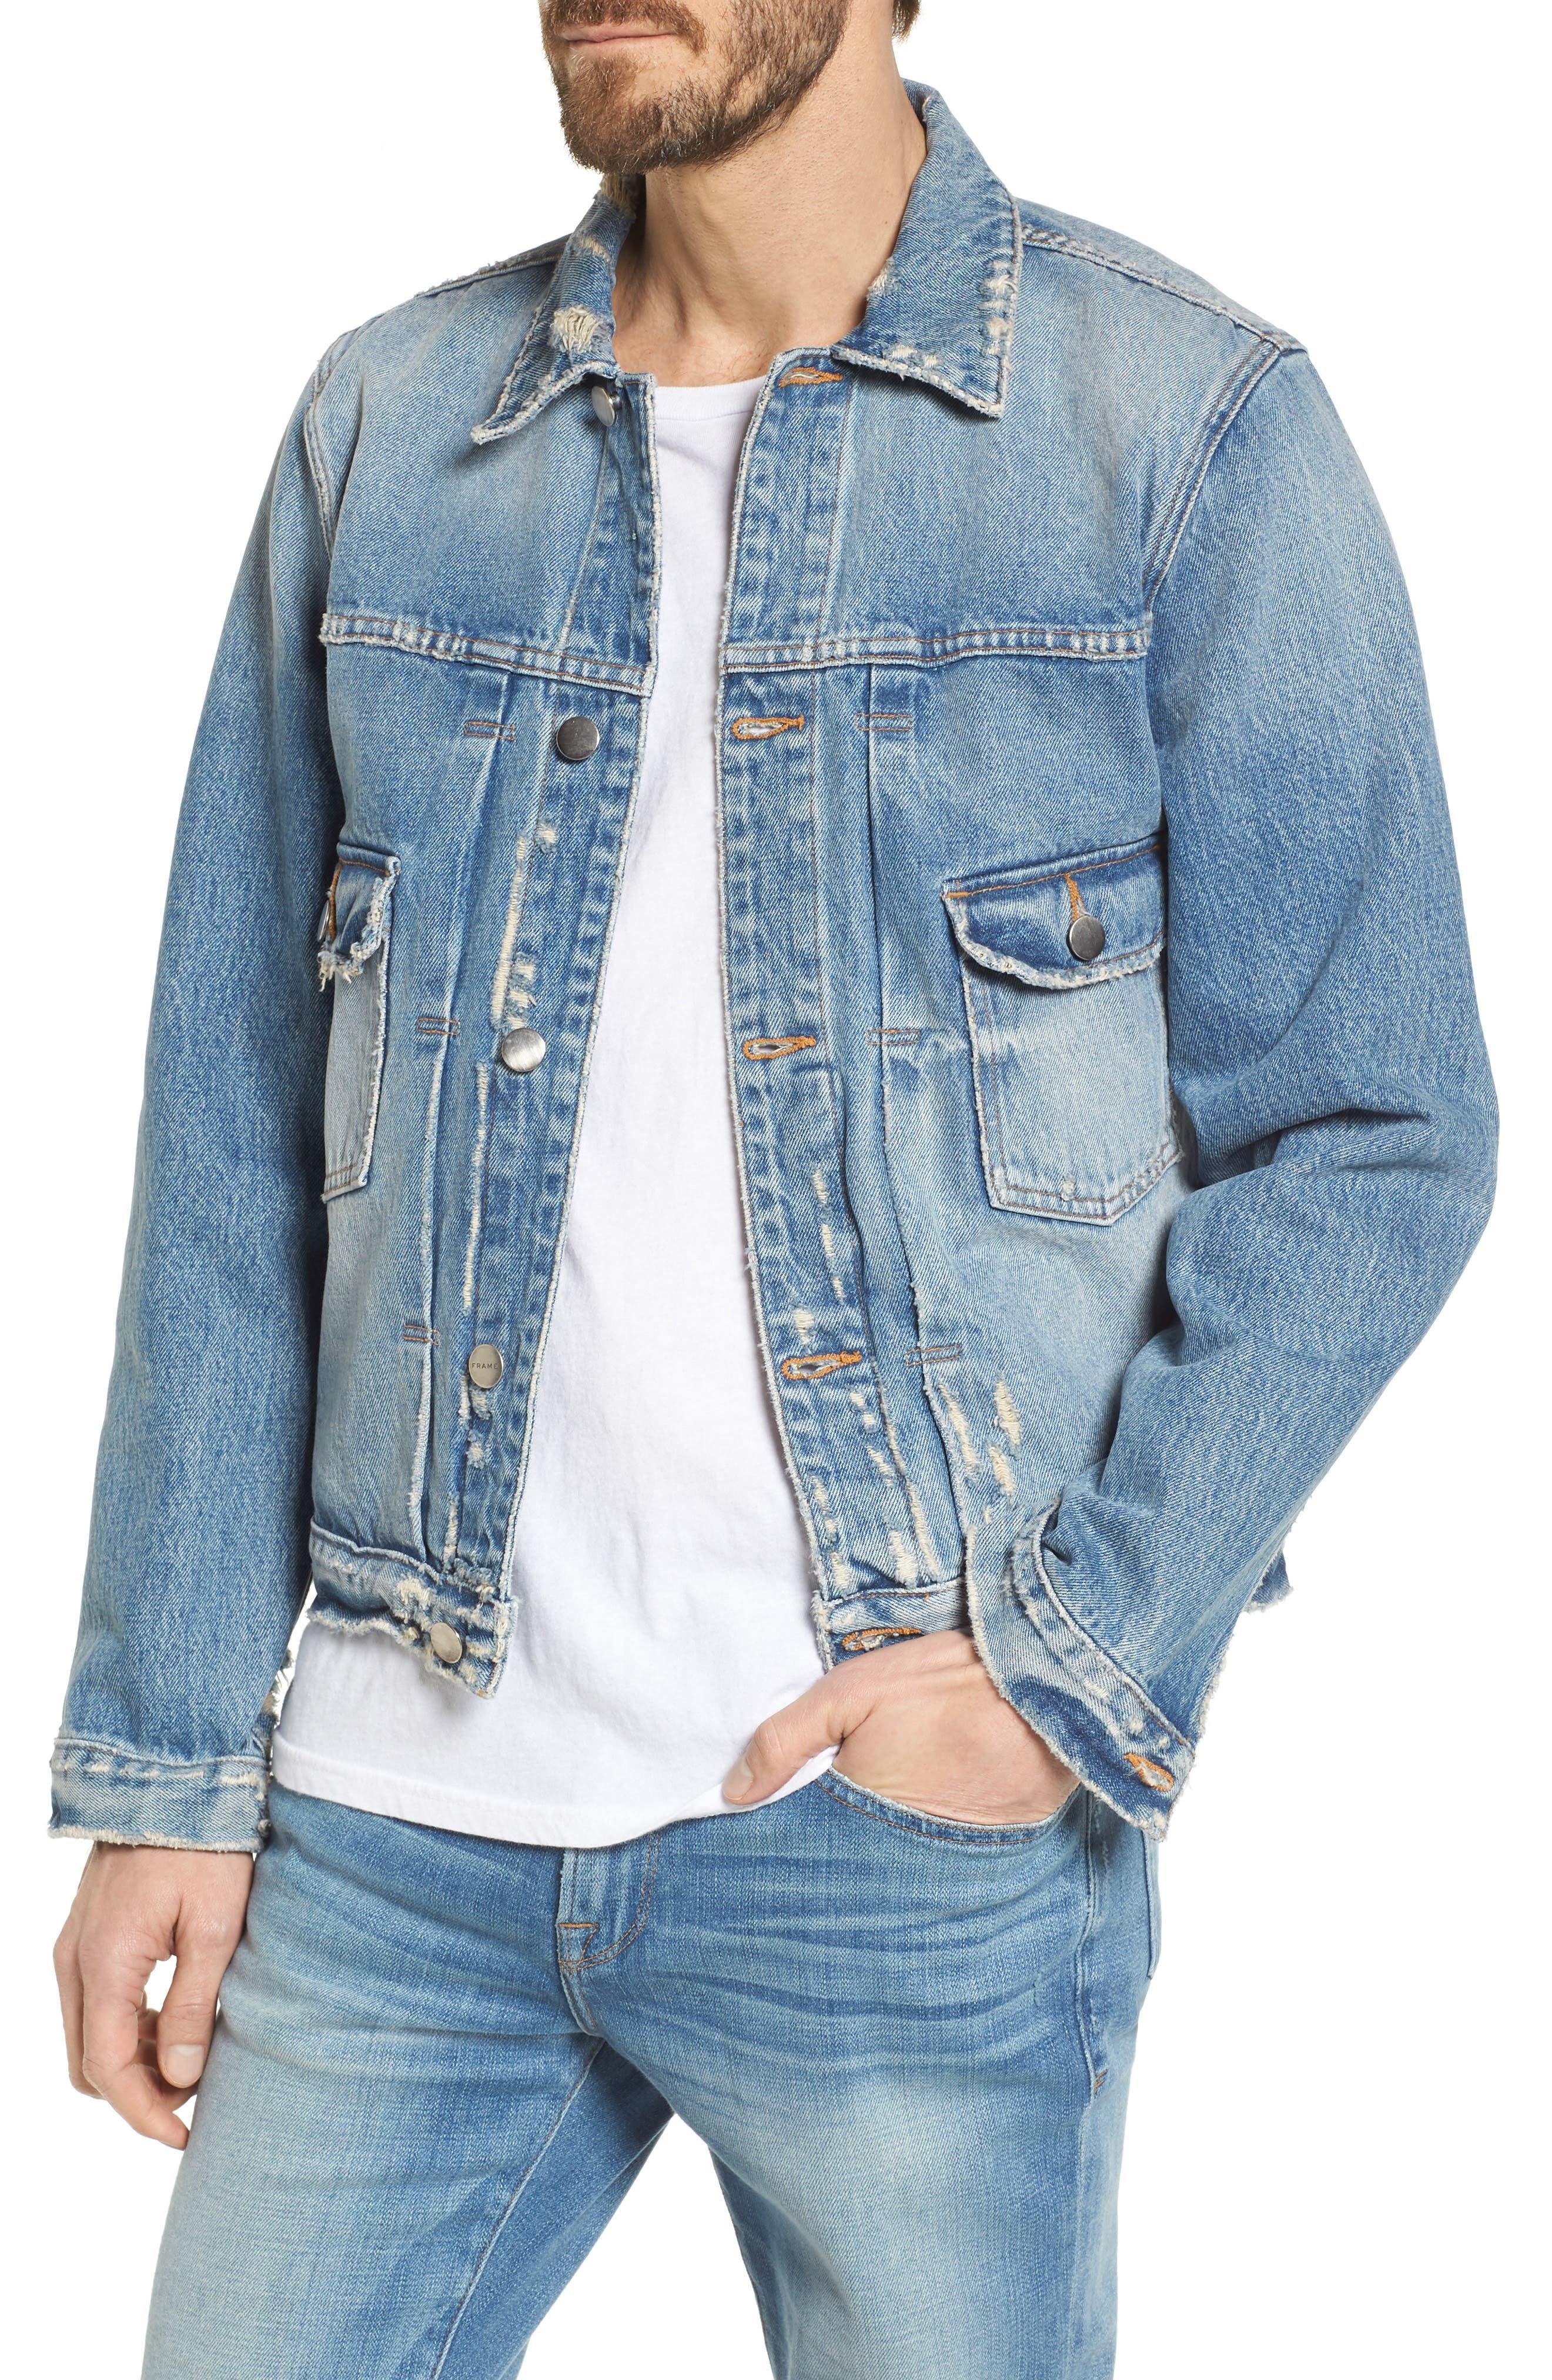 L'Homme Denim Jacket,                         Main,                         color, PIONEER